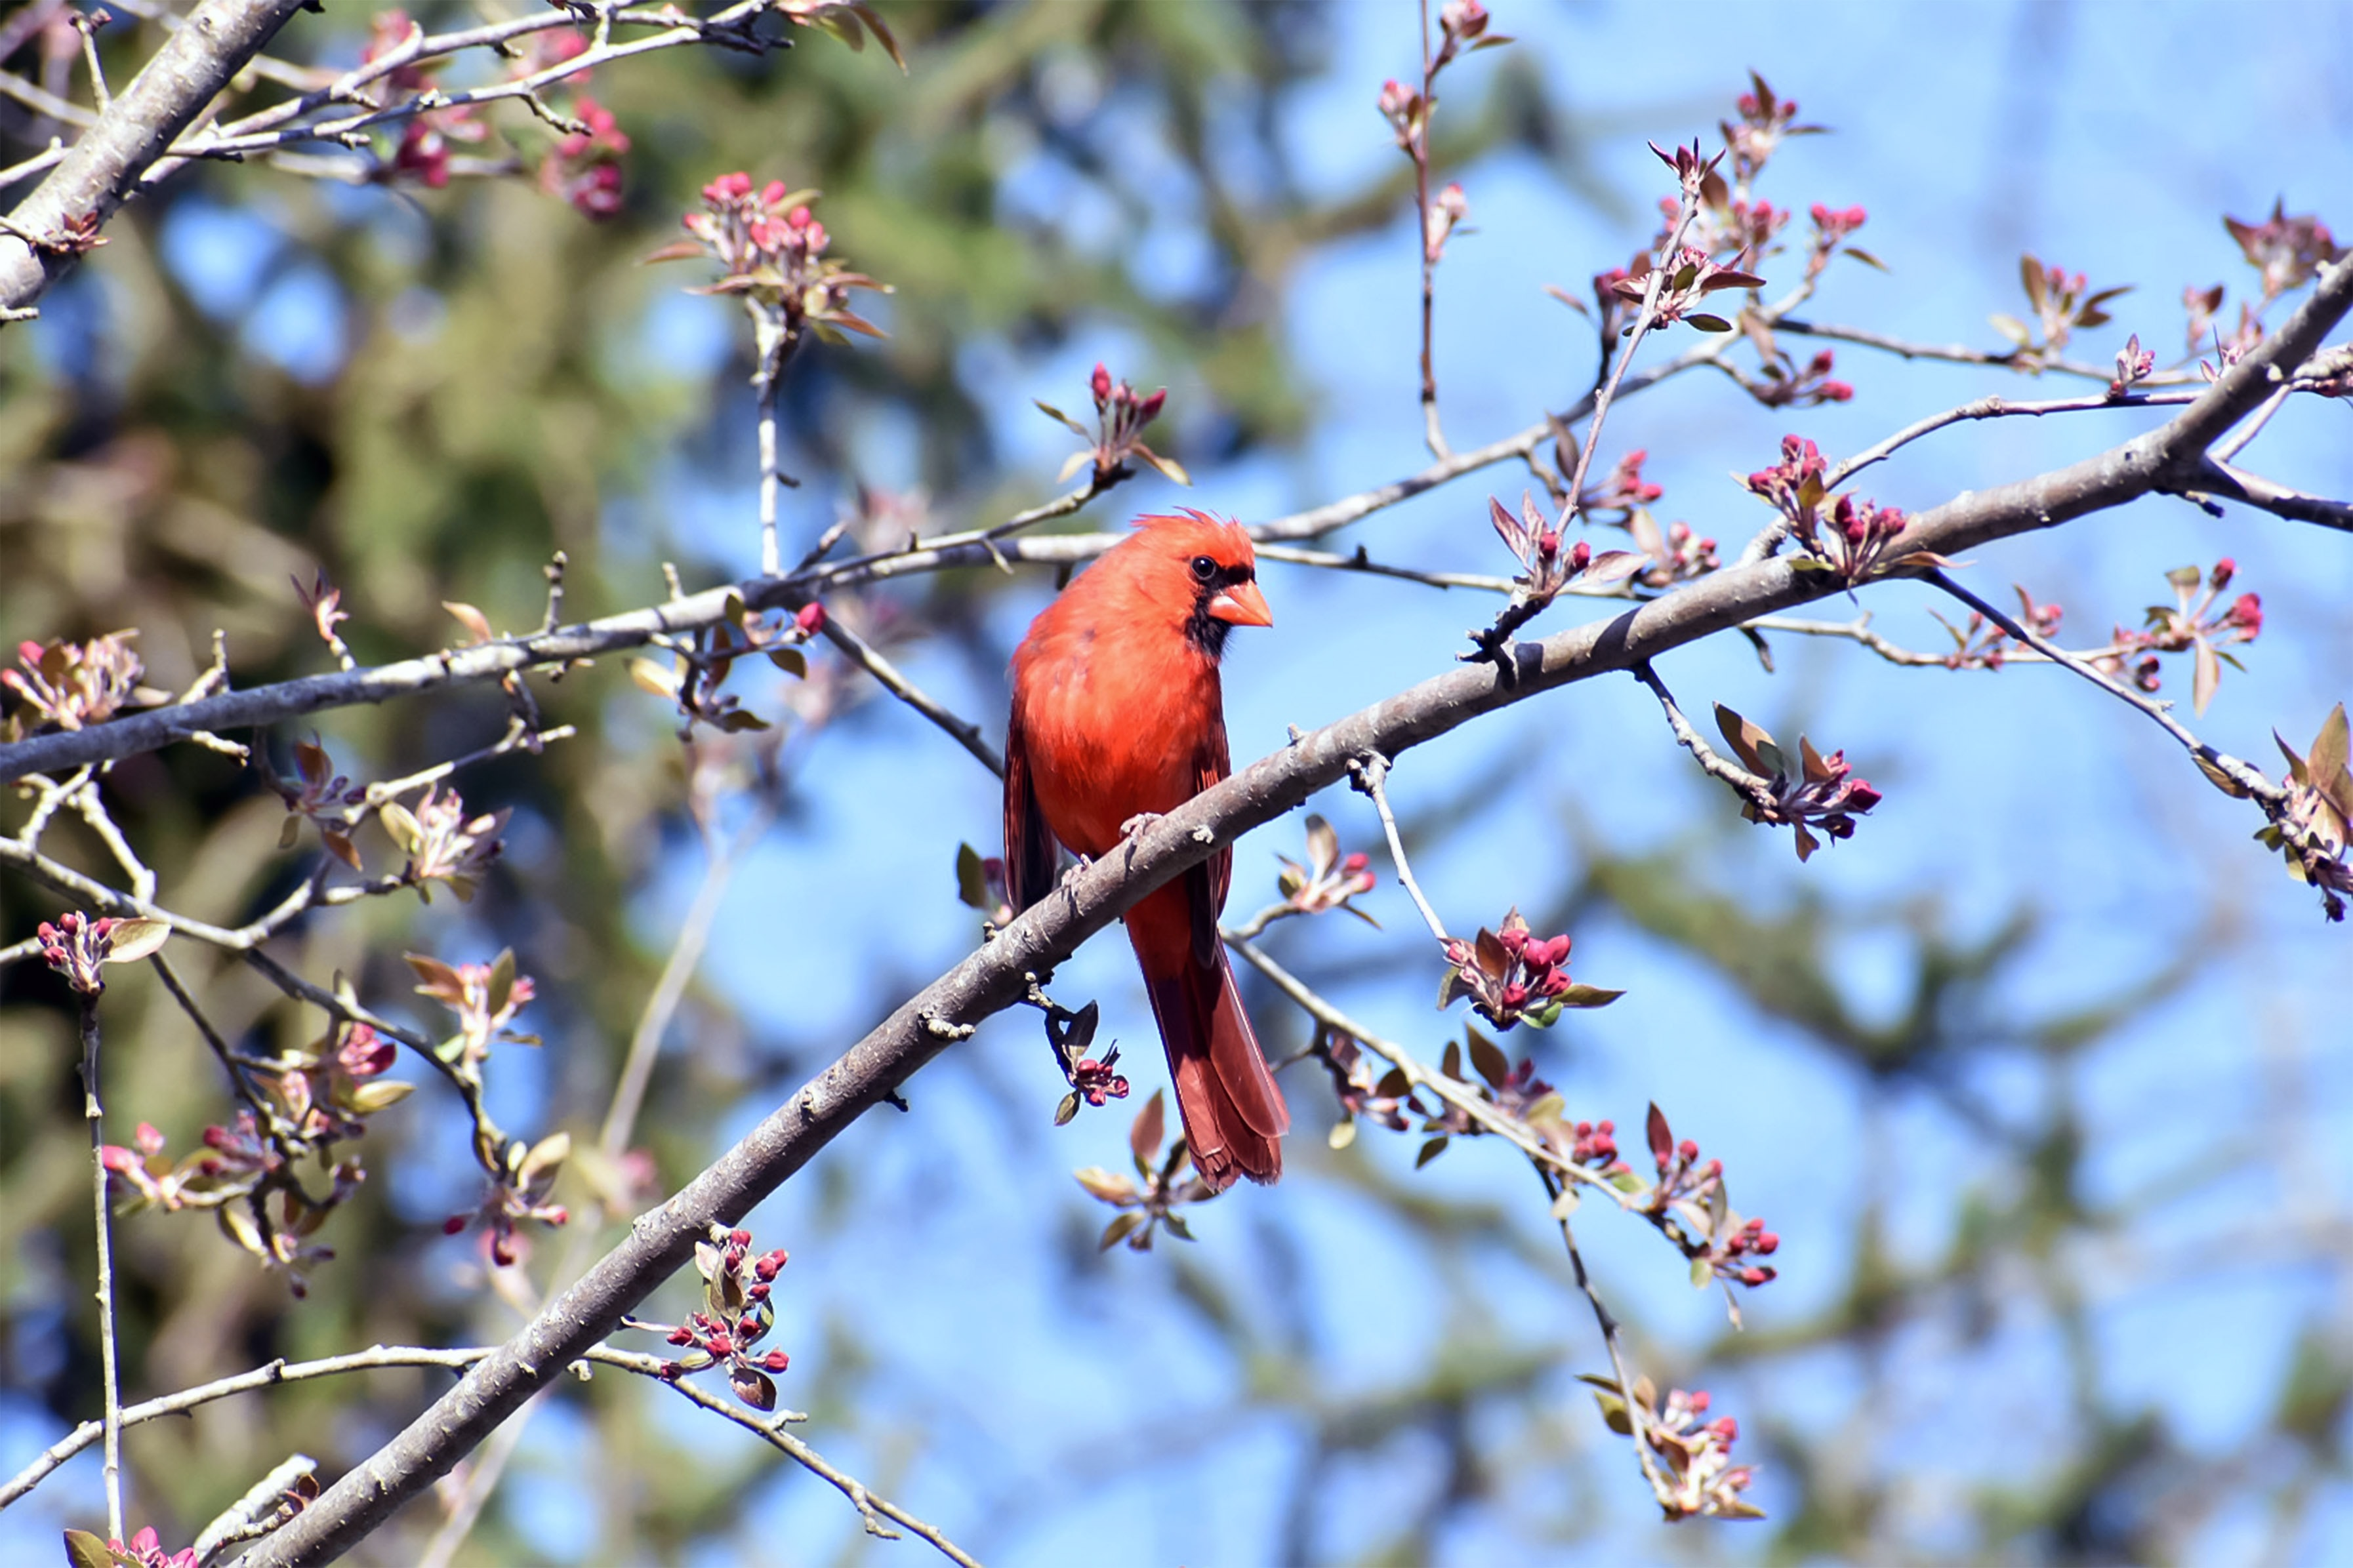 red sparrow bird